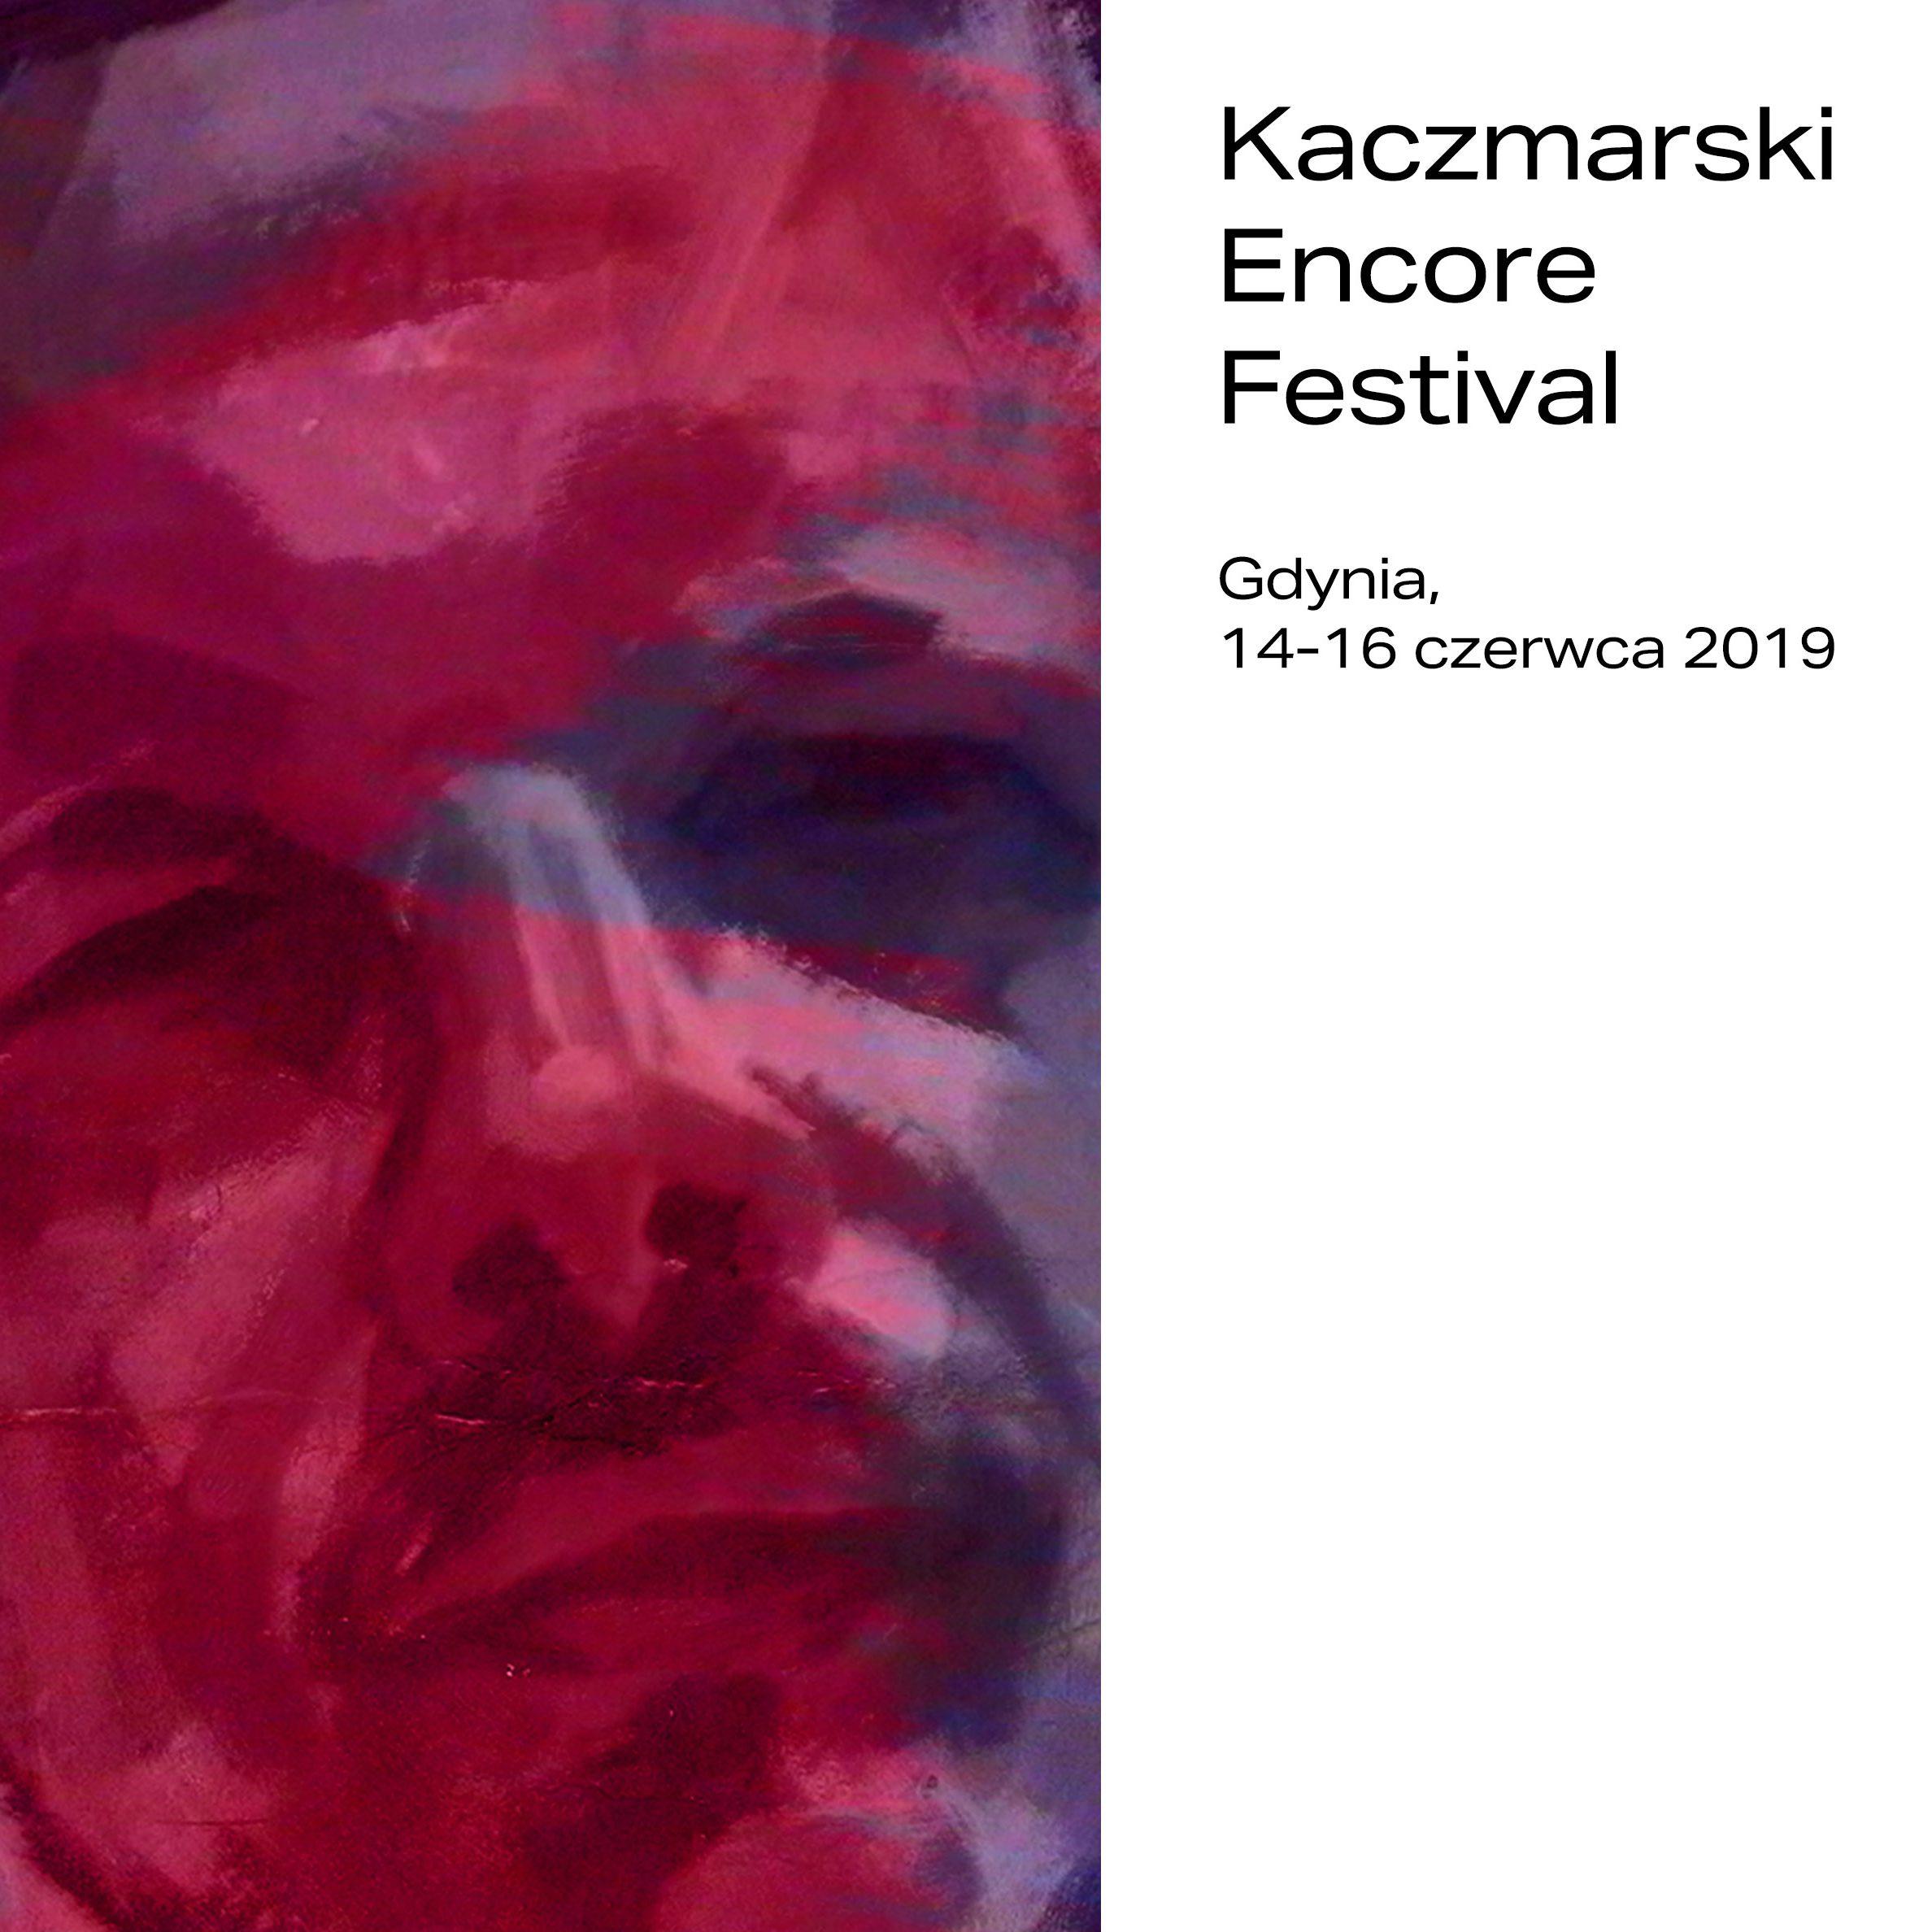 Kaczmarski Encore Festival – Konkurs piosenki